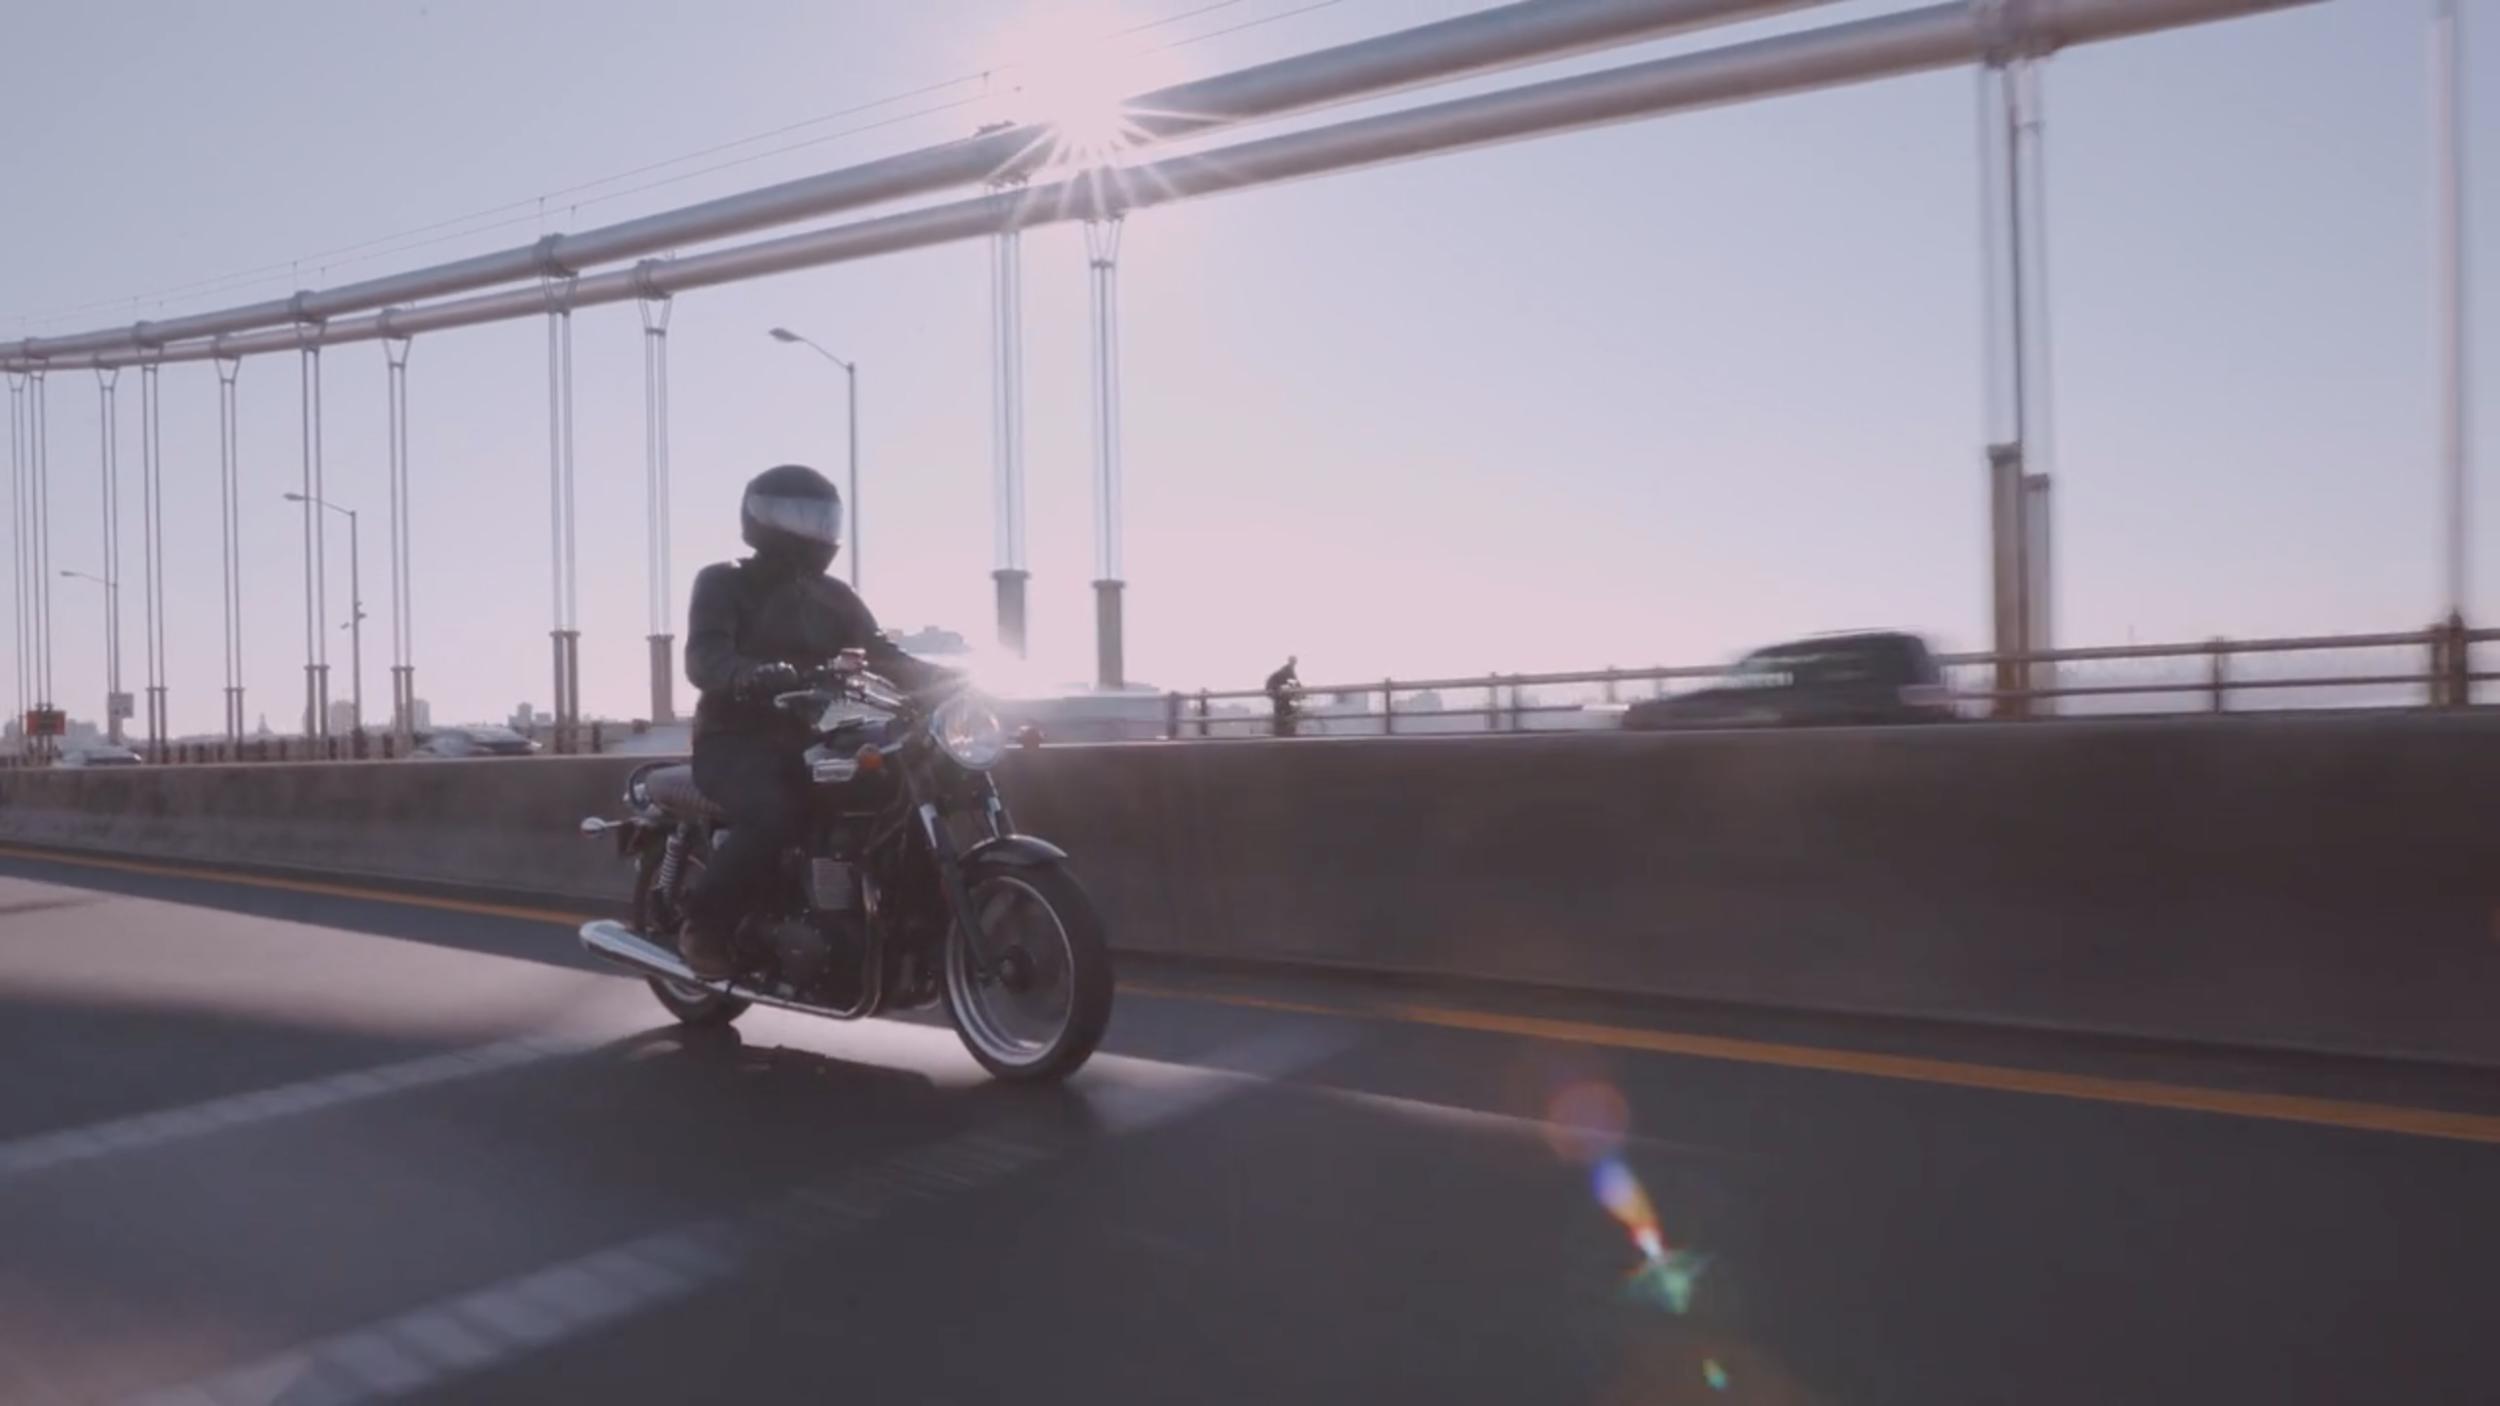 'Chasing Daylight' - Personal / Short